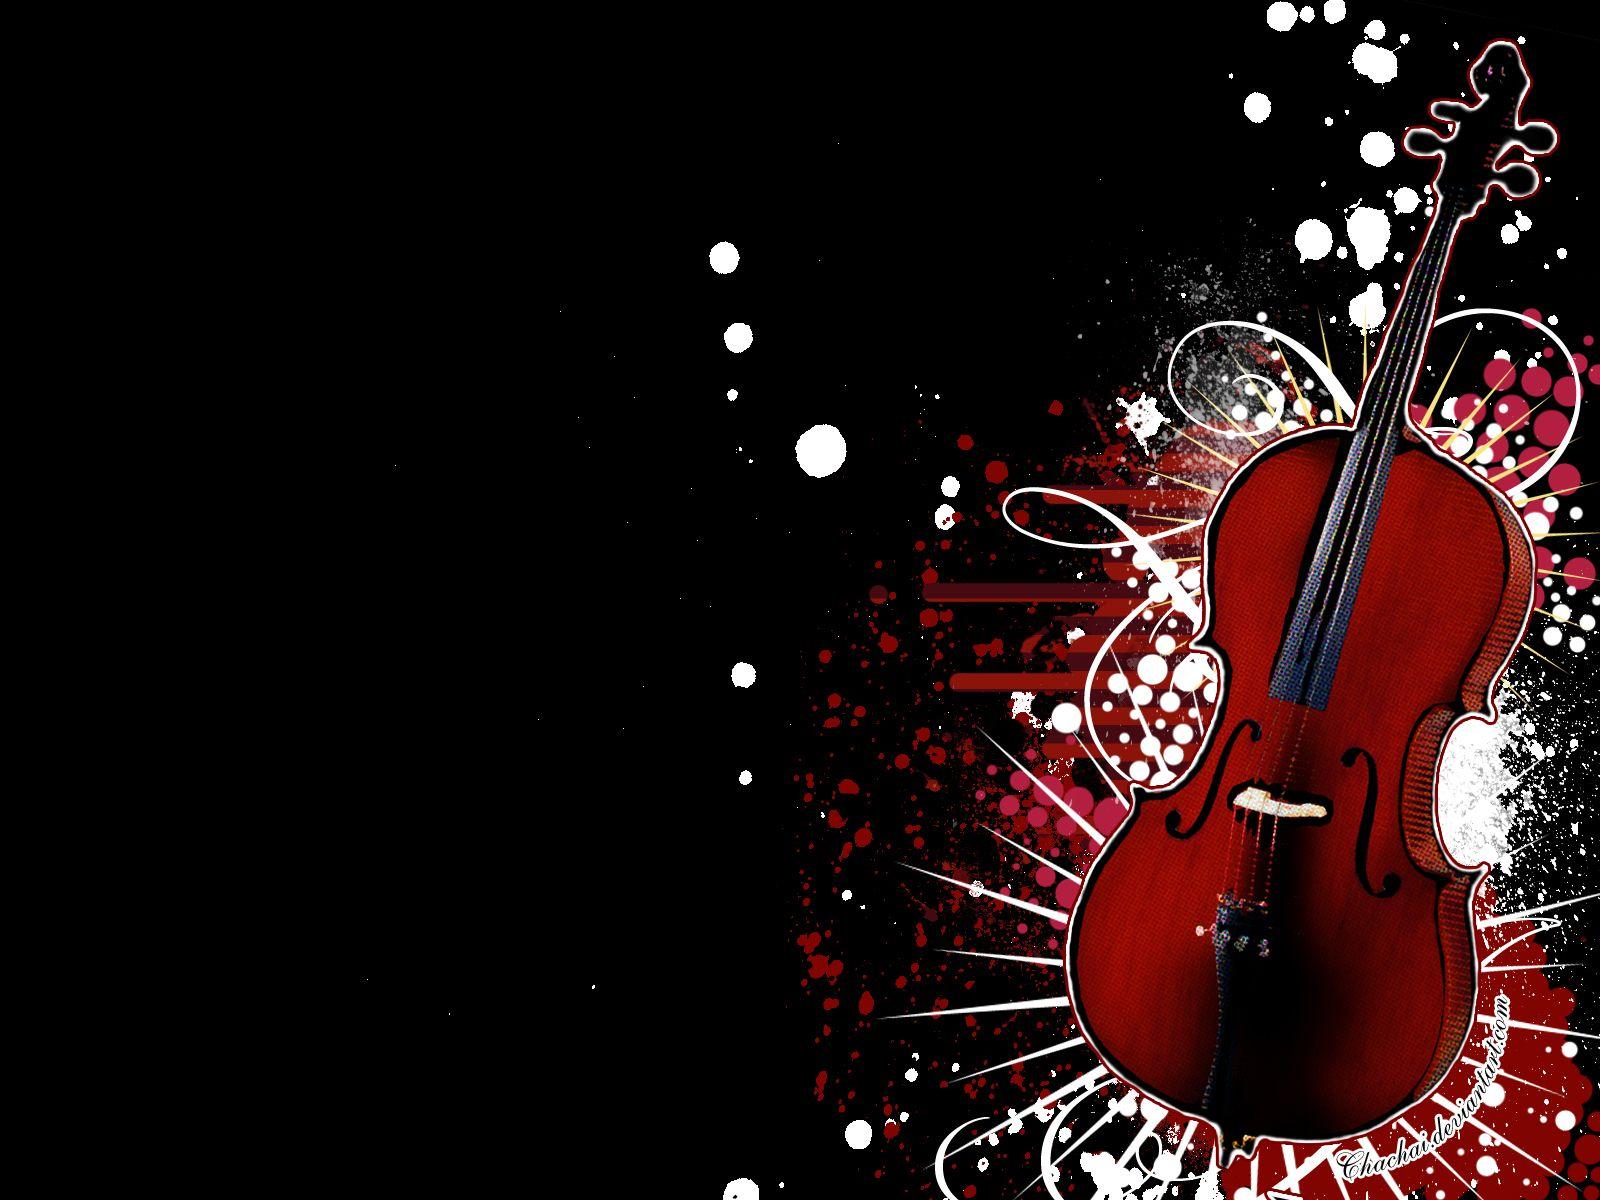 Cello Wallpaper Photo 22287 Hd Pictures: I Am A Cellist.